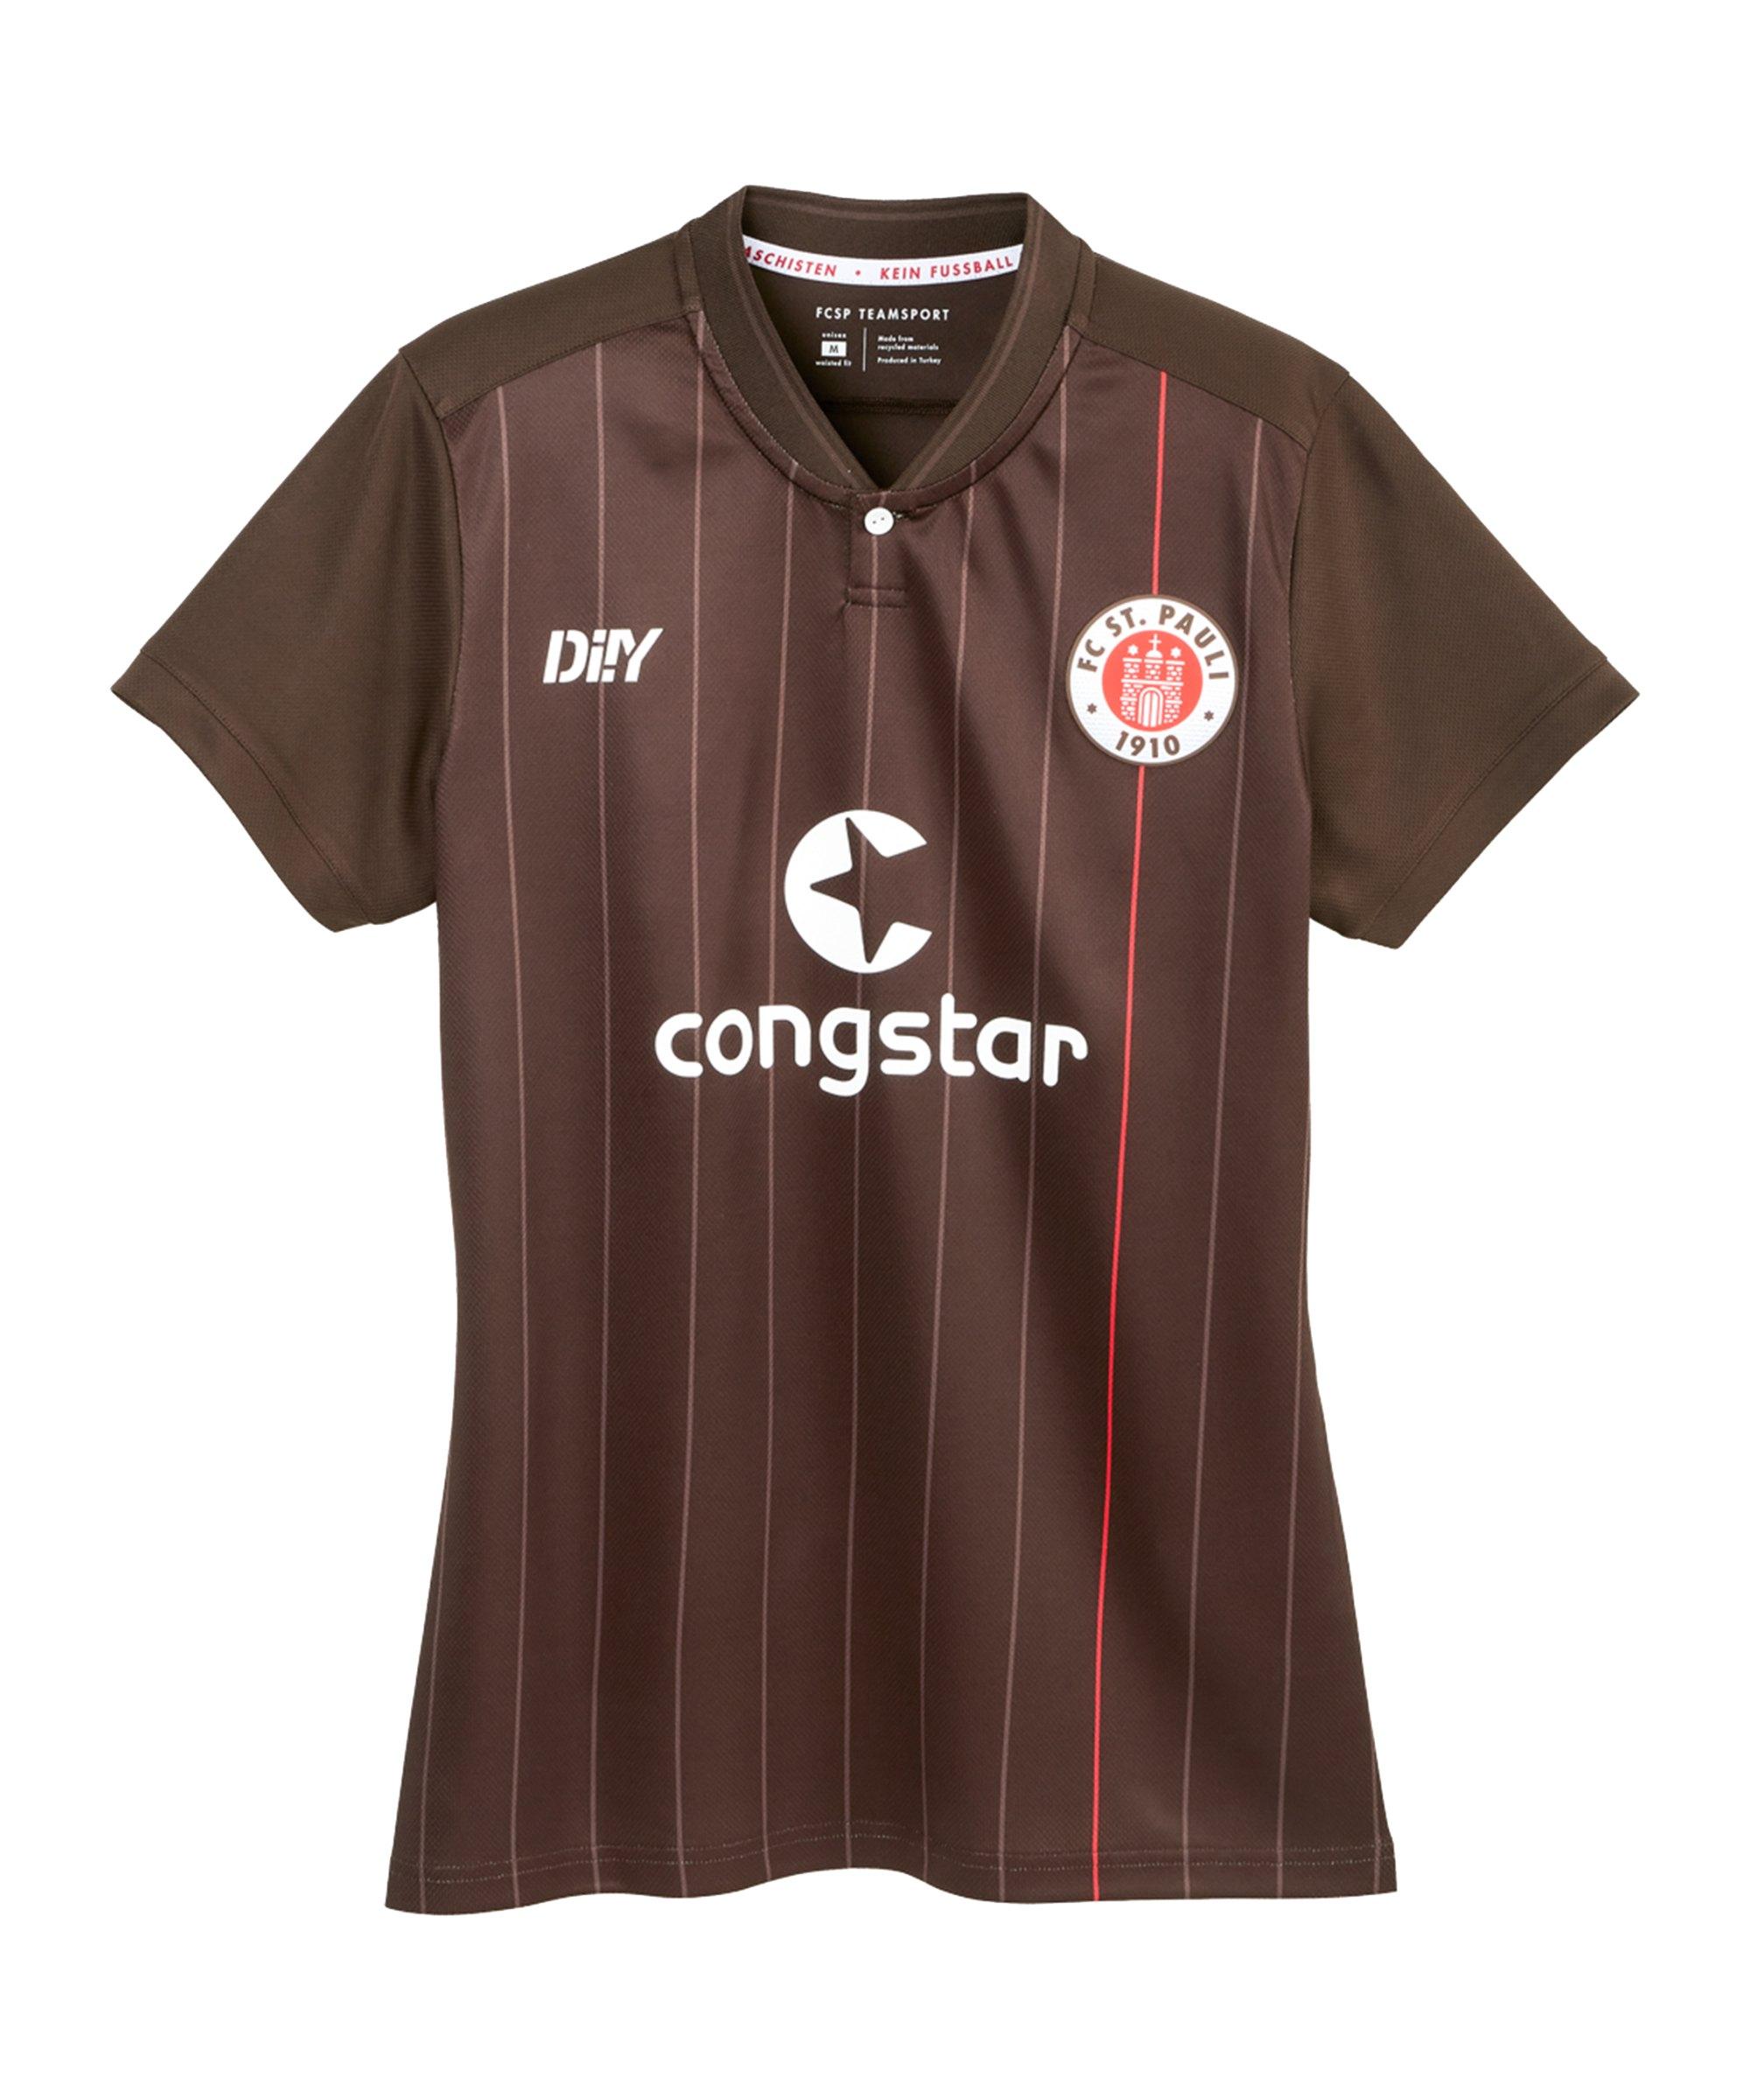 DIIY FC St. Pauli Trikot Home 2021/2022 Damen Braun - braun